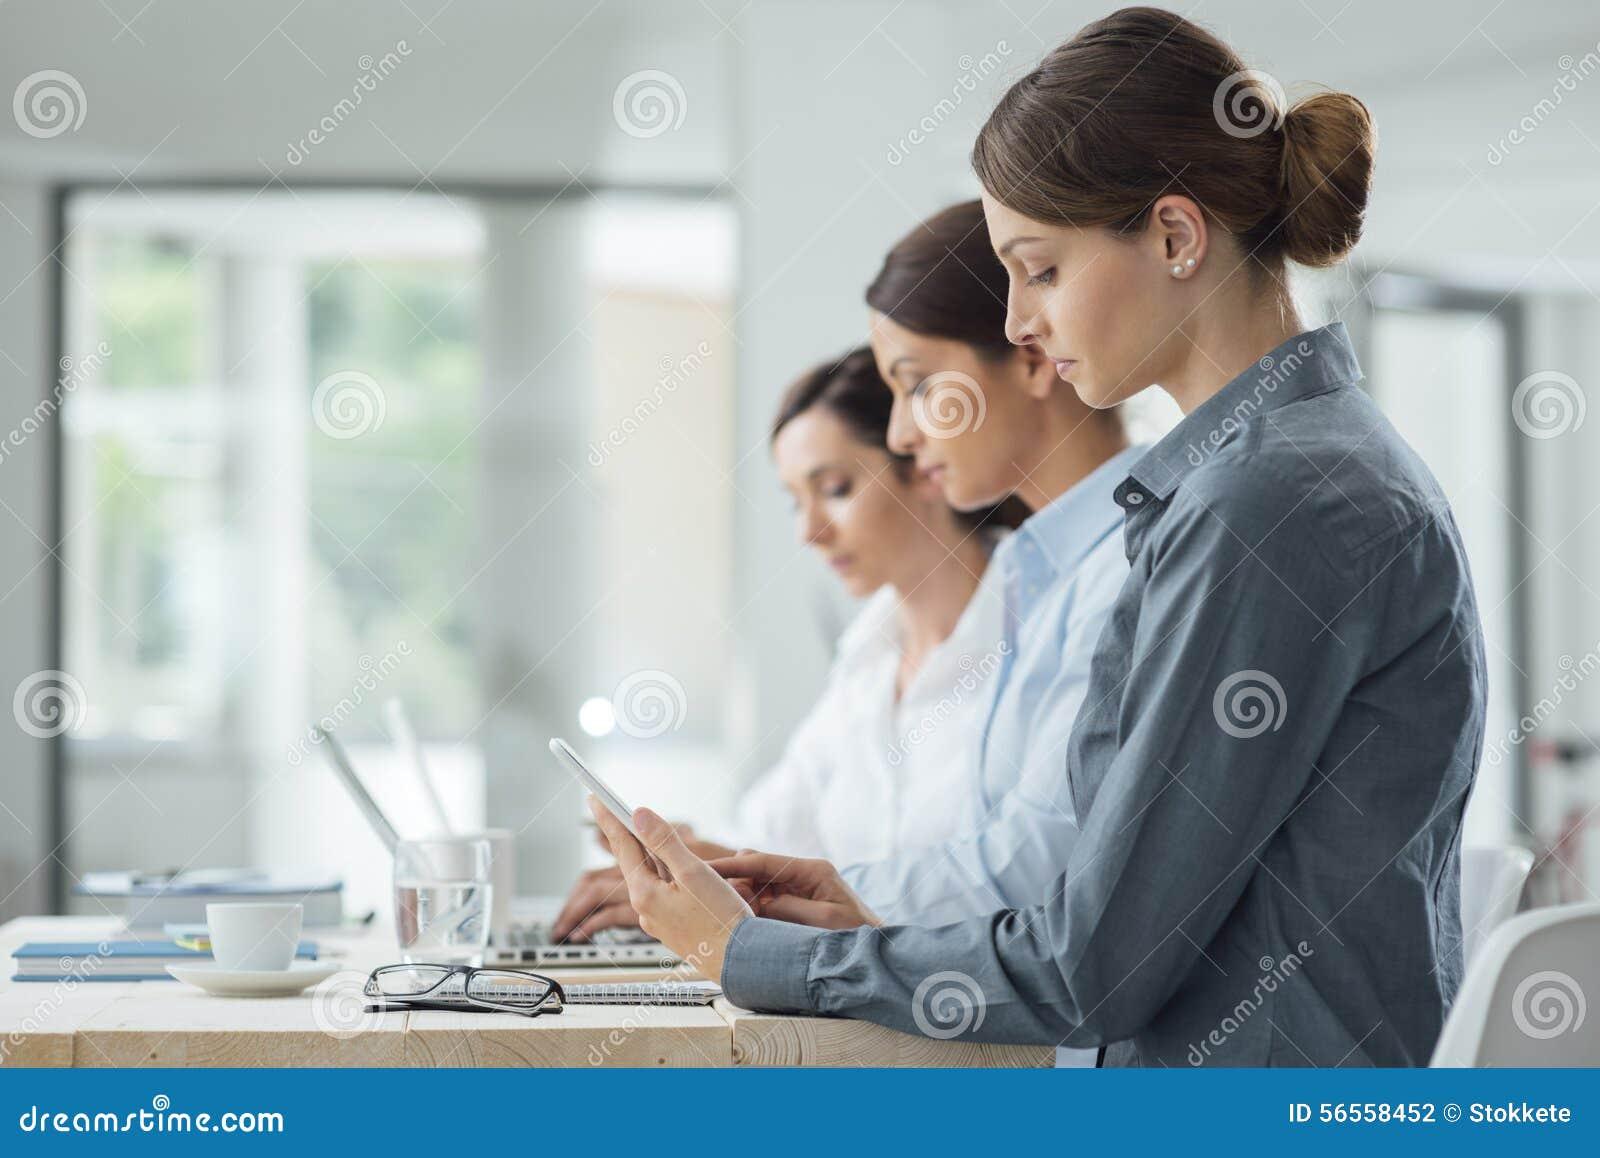 Download Αποδοτικές επιχειρησιακές γυναίκες που εργάζονται από κοινού Στοκ Εικόνες - εικόνα από επιχείρηση, γραφείο: 56558452